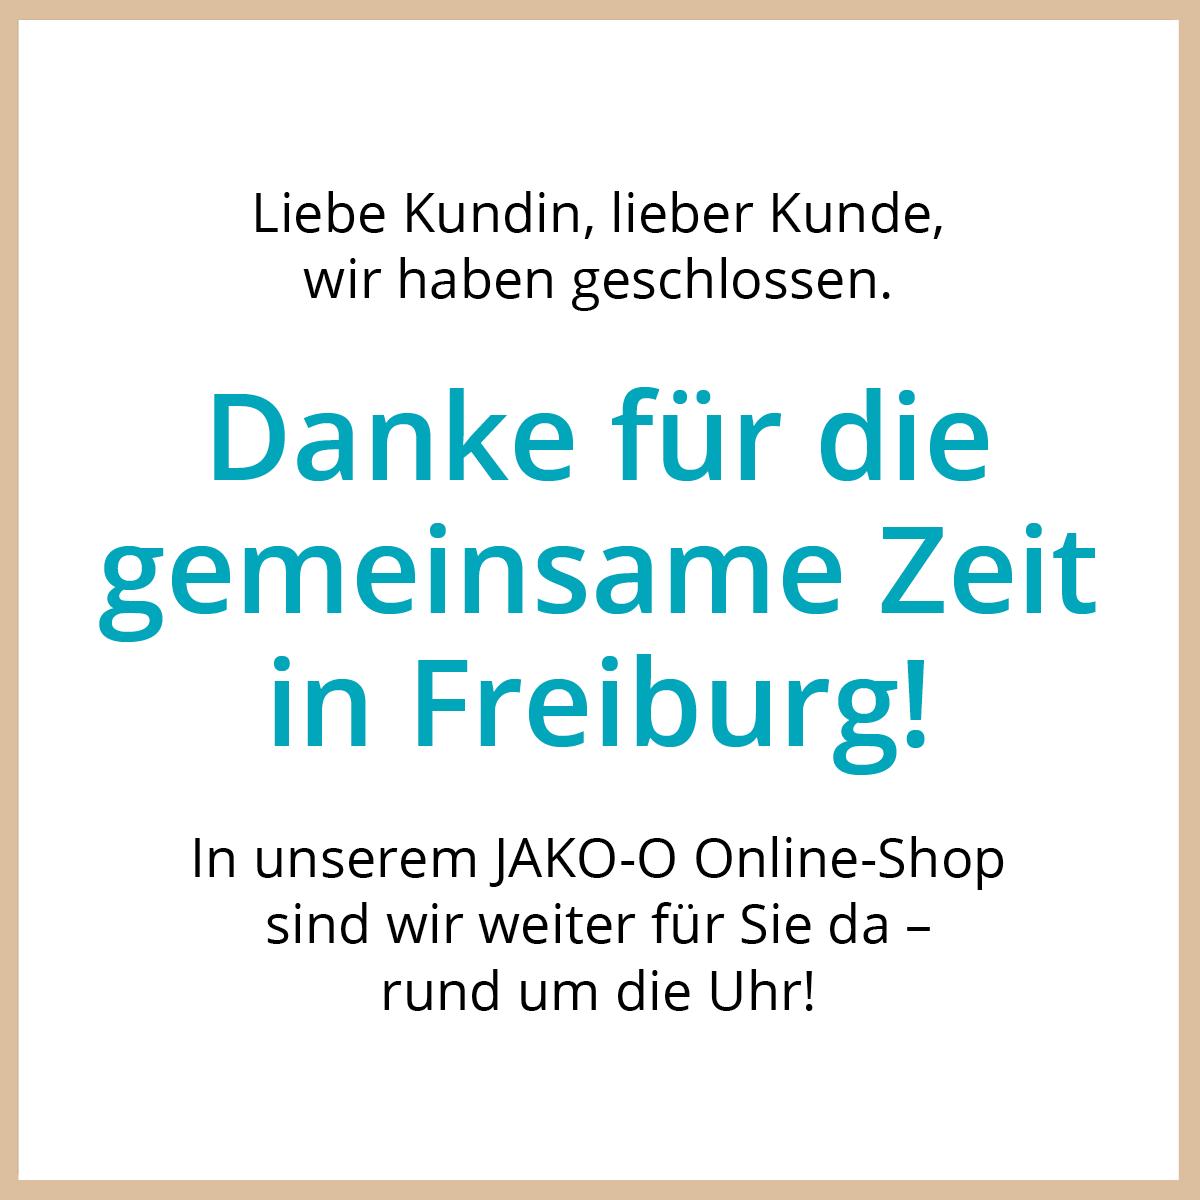 JAKO-O Filiale Freiburg - geschlossen, Schwarzwaldstraße 78 in Freiburg